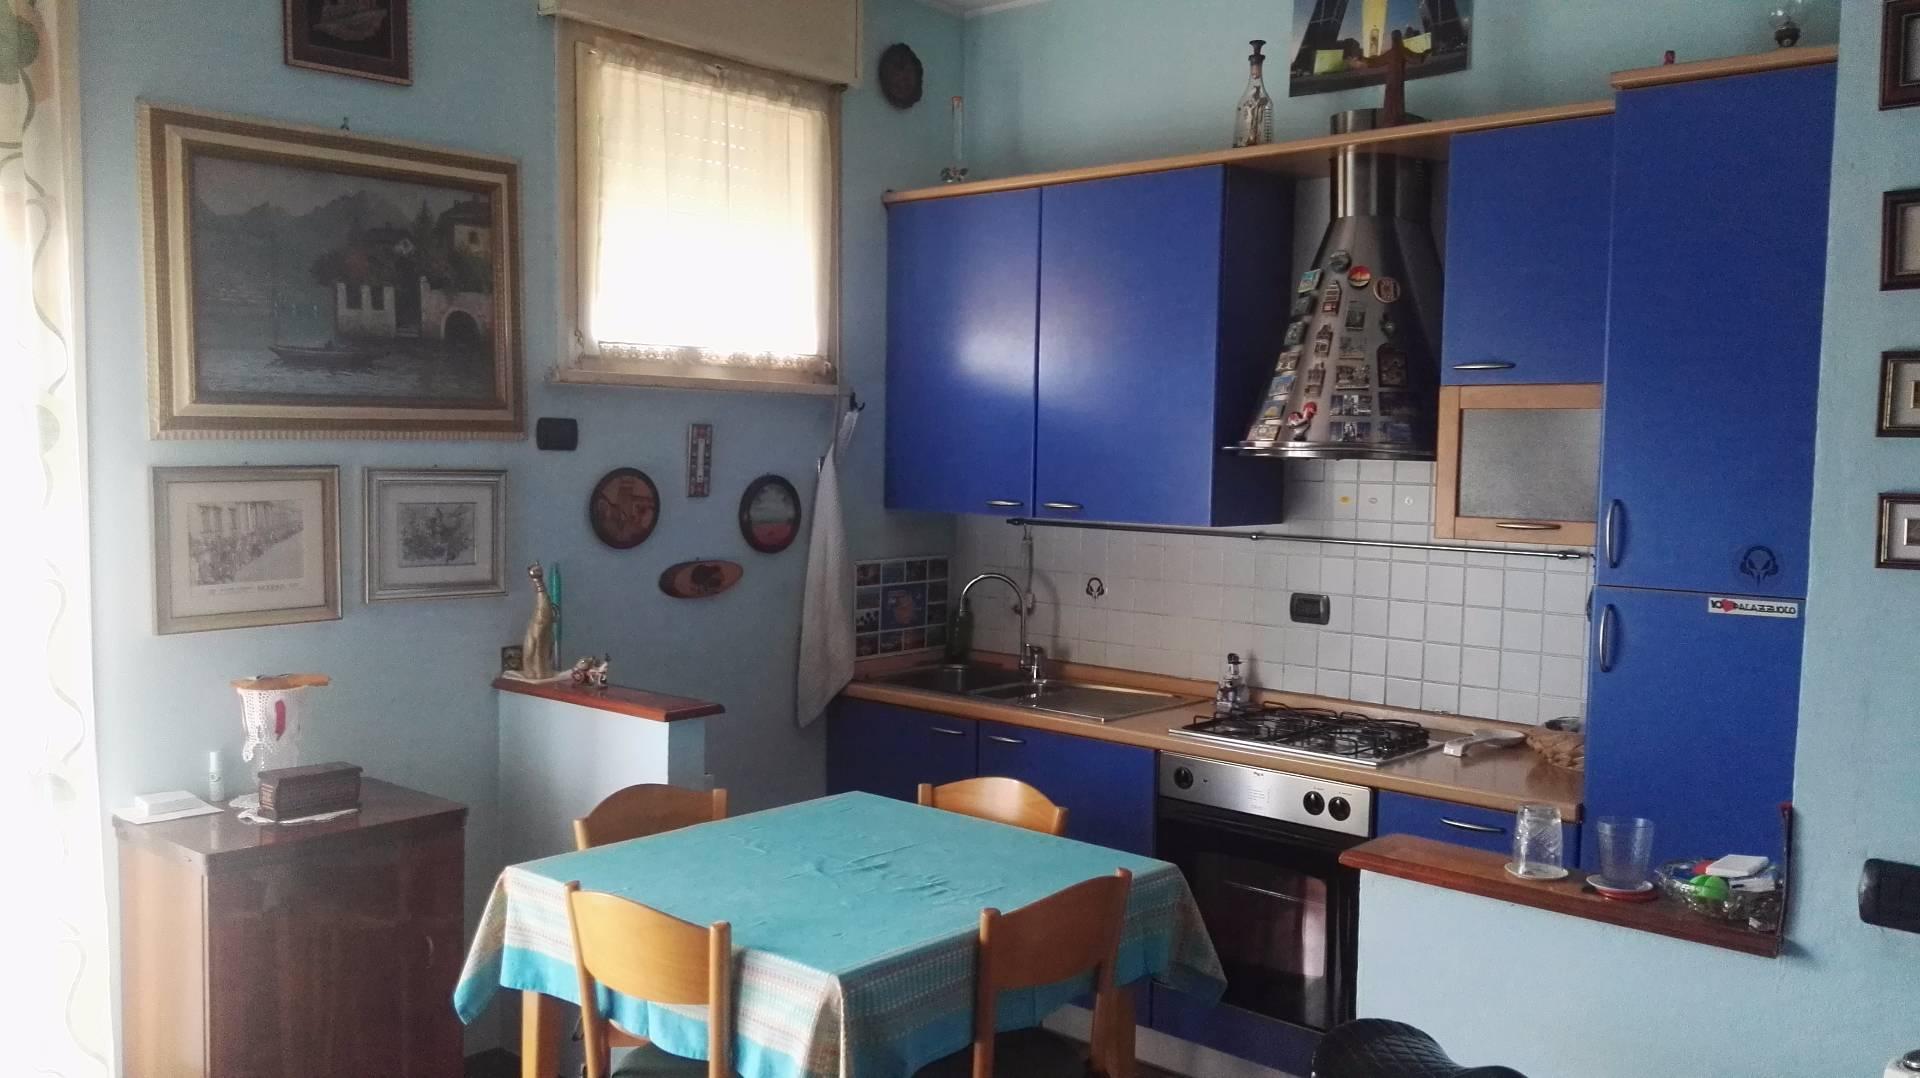 Bilocale vendita ravenna vicolo dei francesi for Planimetrie di cottage francesi